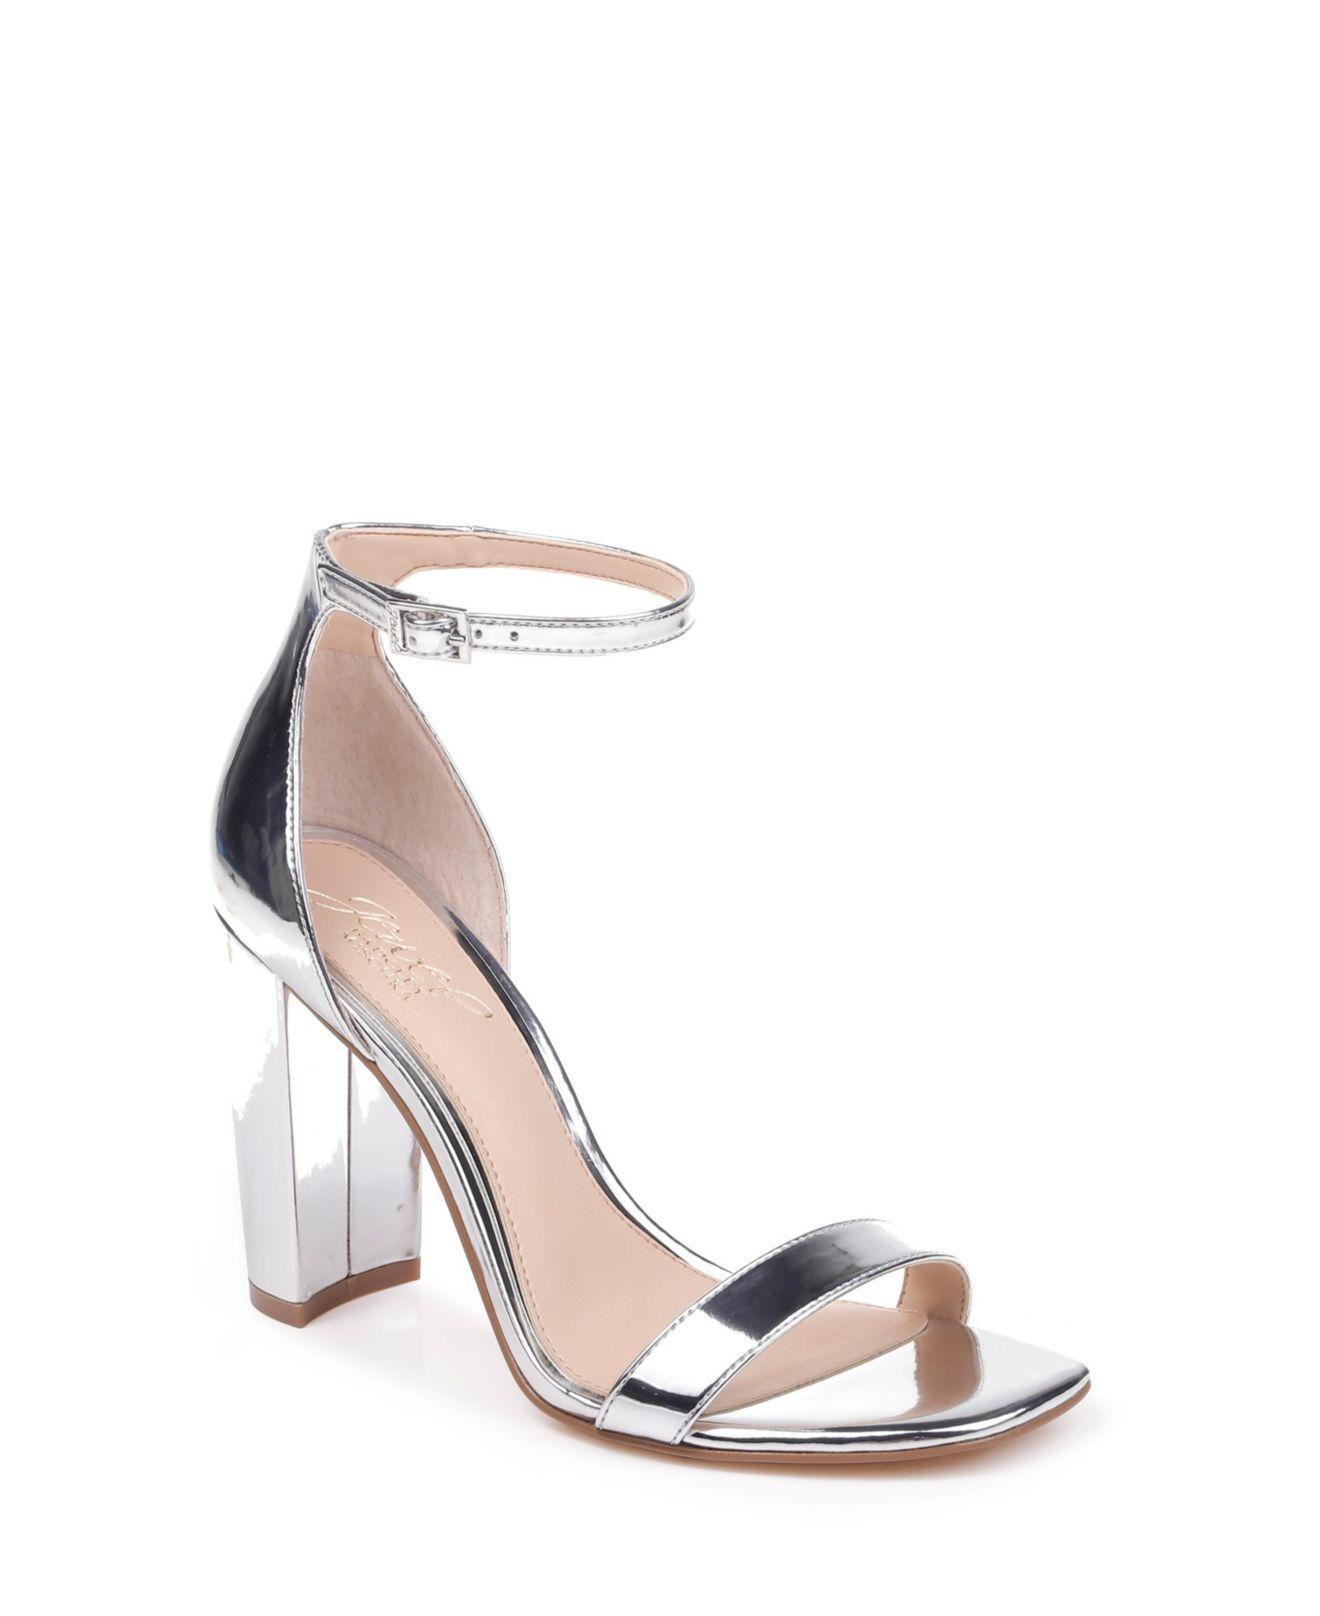 c3211ae20 Badgley Mischka. Women's Metallic Jewel By Badgley Mischka Keshia Evening  Sandals